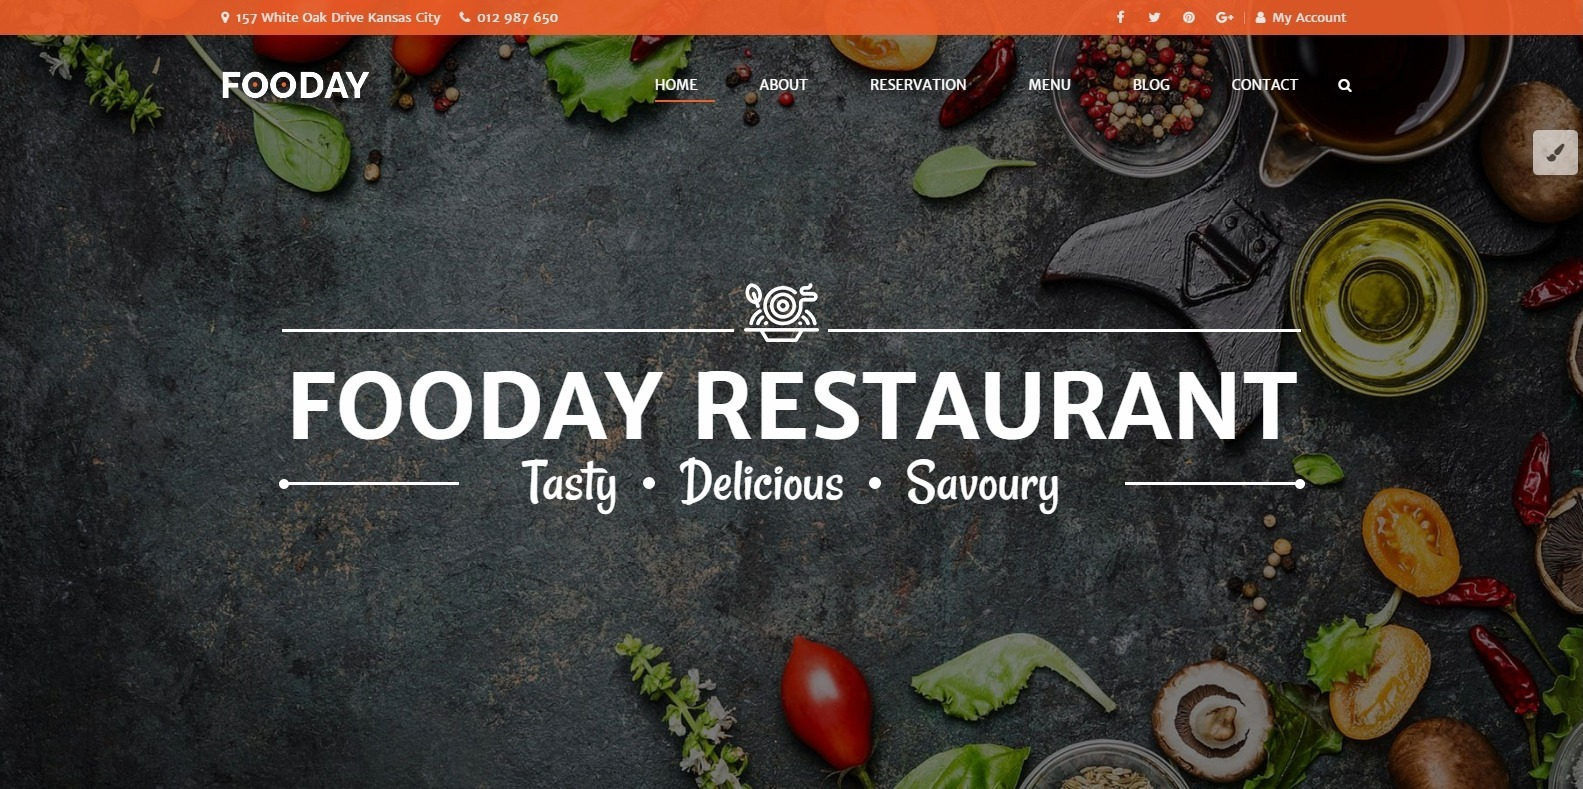 fooday-restaurant-website-template